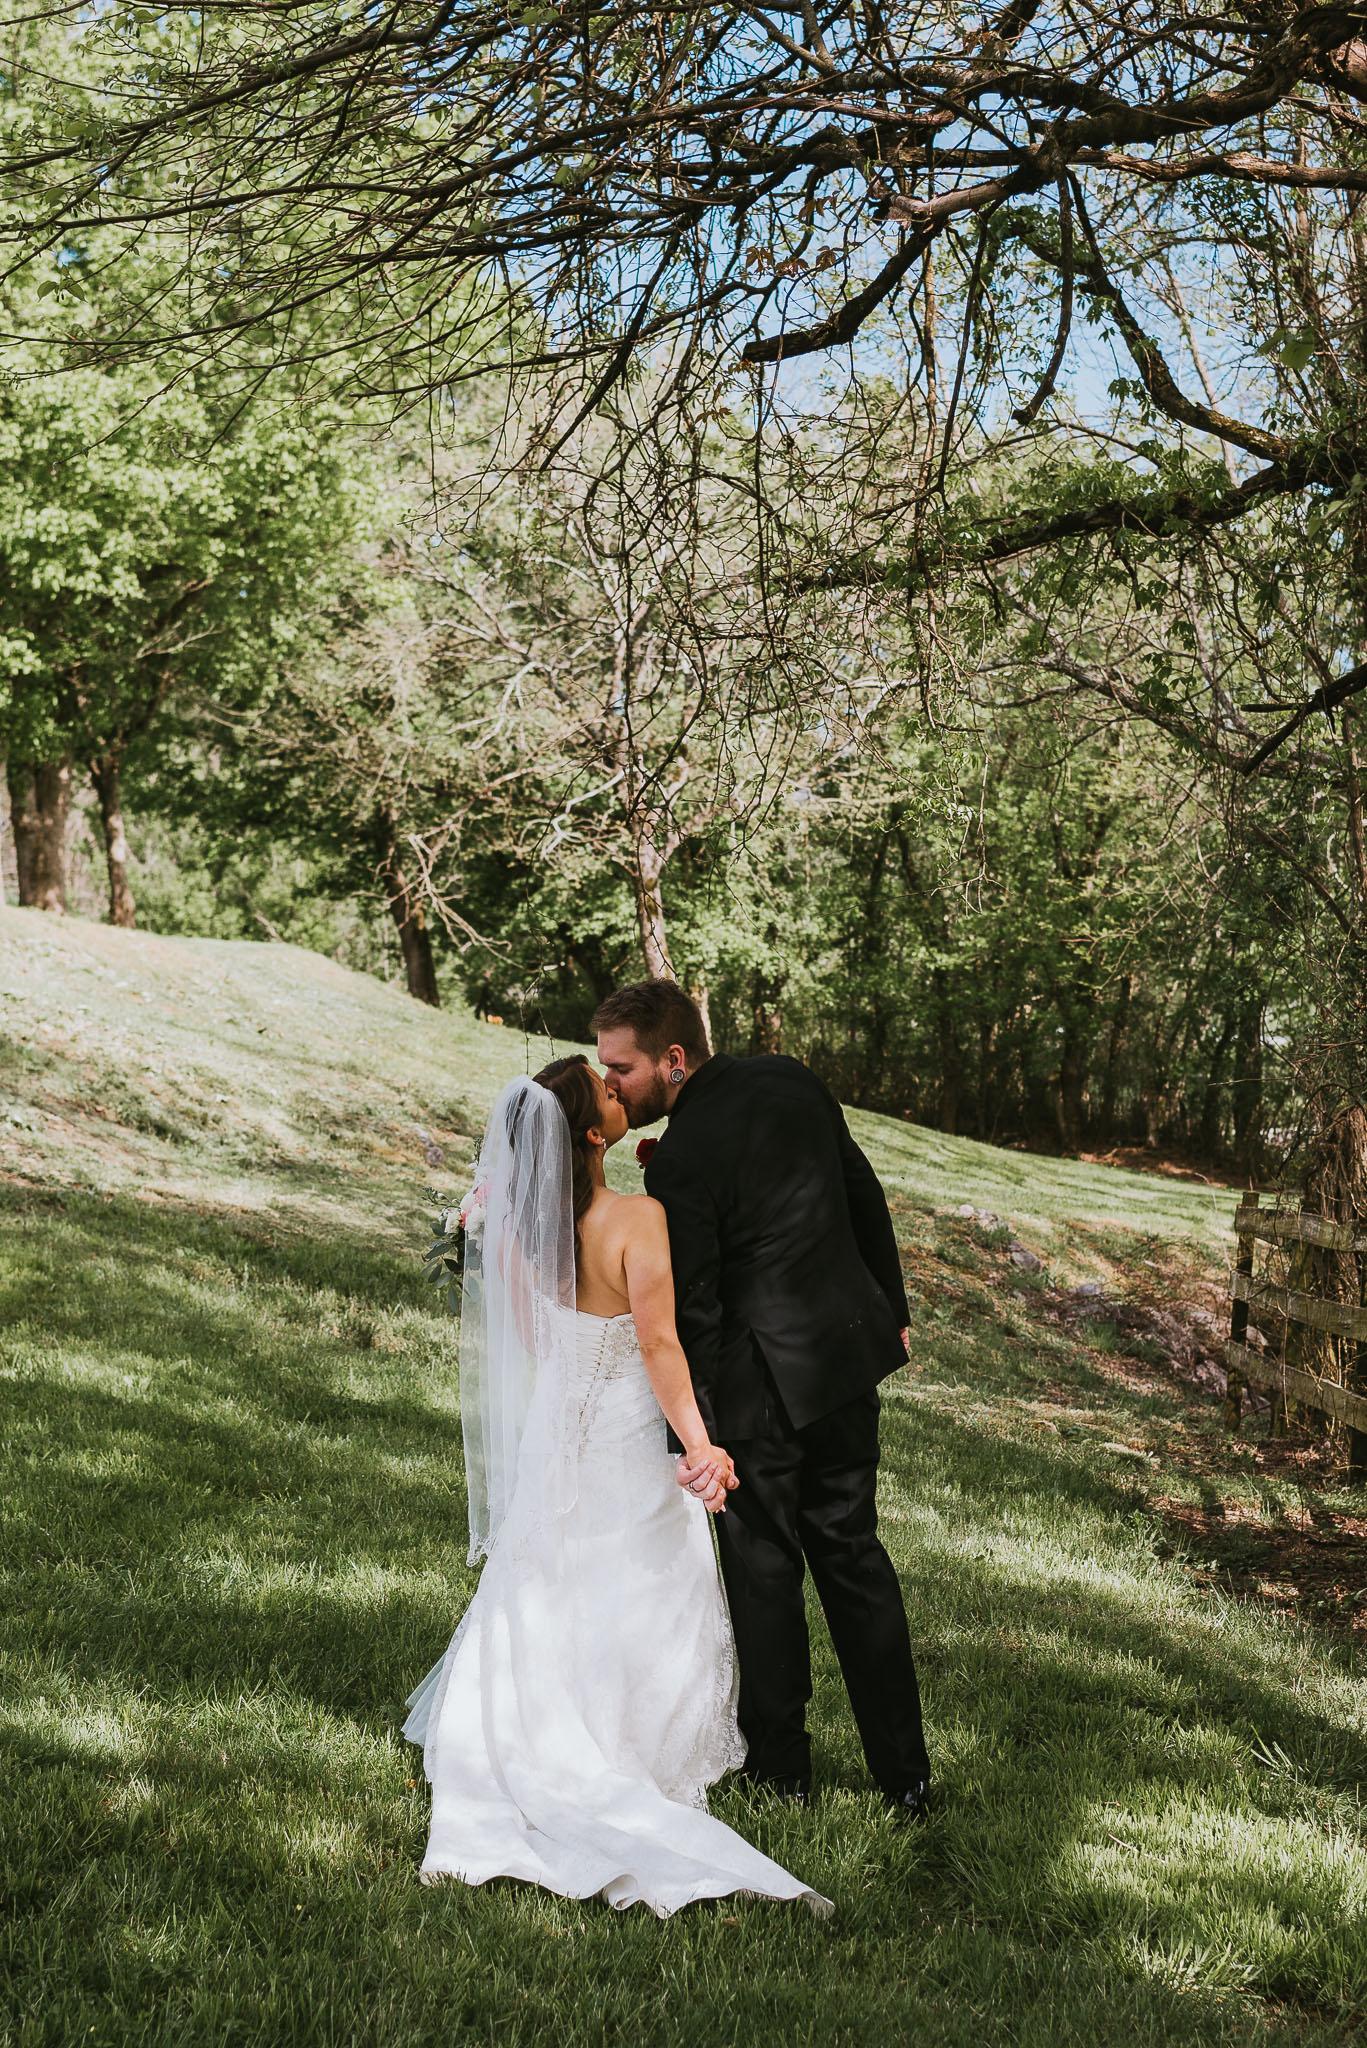 Broken J Farm Wedding In Bristol, Tennessee, Northeast Tennessee Wedding Photographer, East Tennessee Wedding Photographer, Knoxville, Tennessee Wedding Photographer